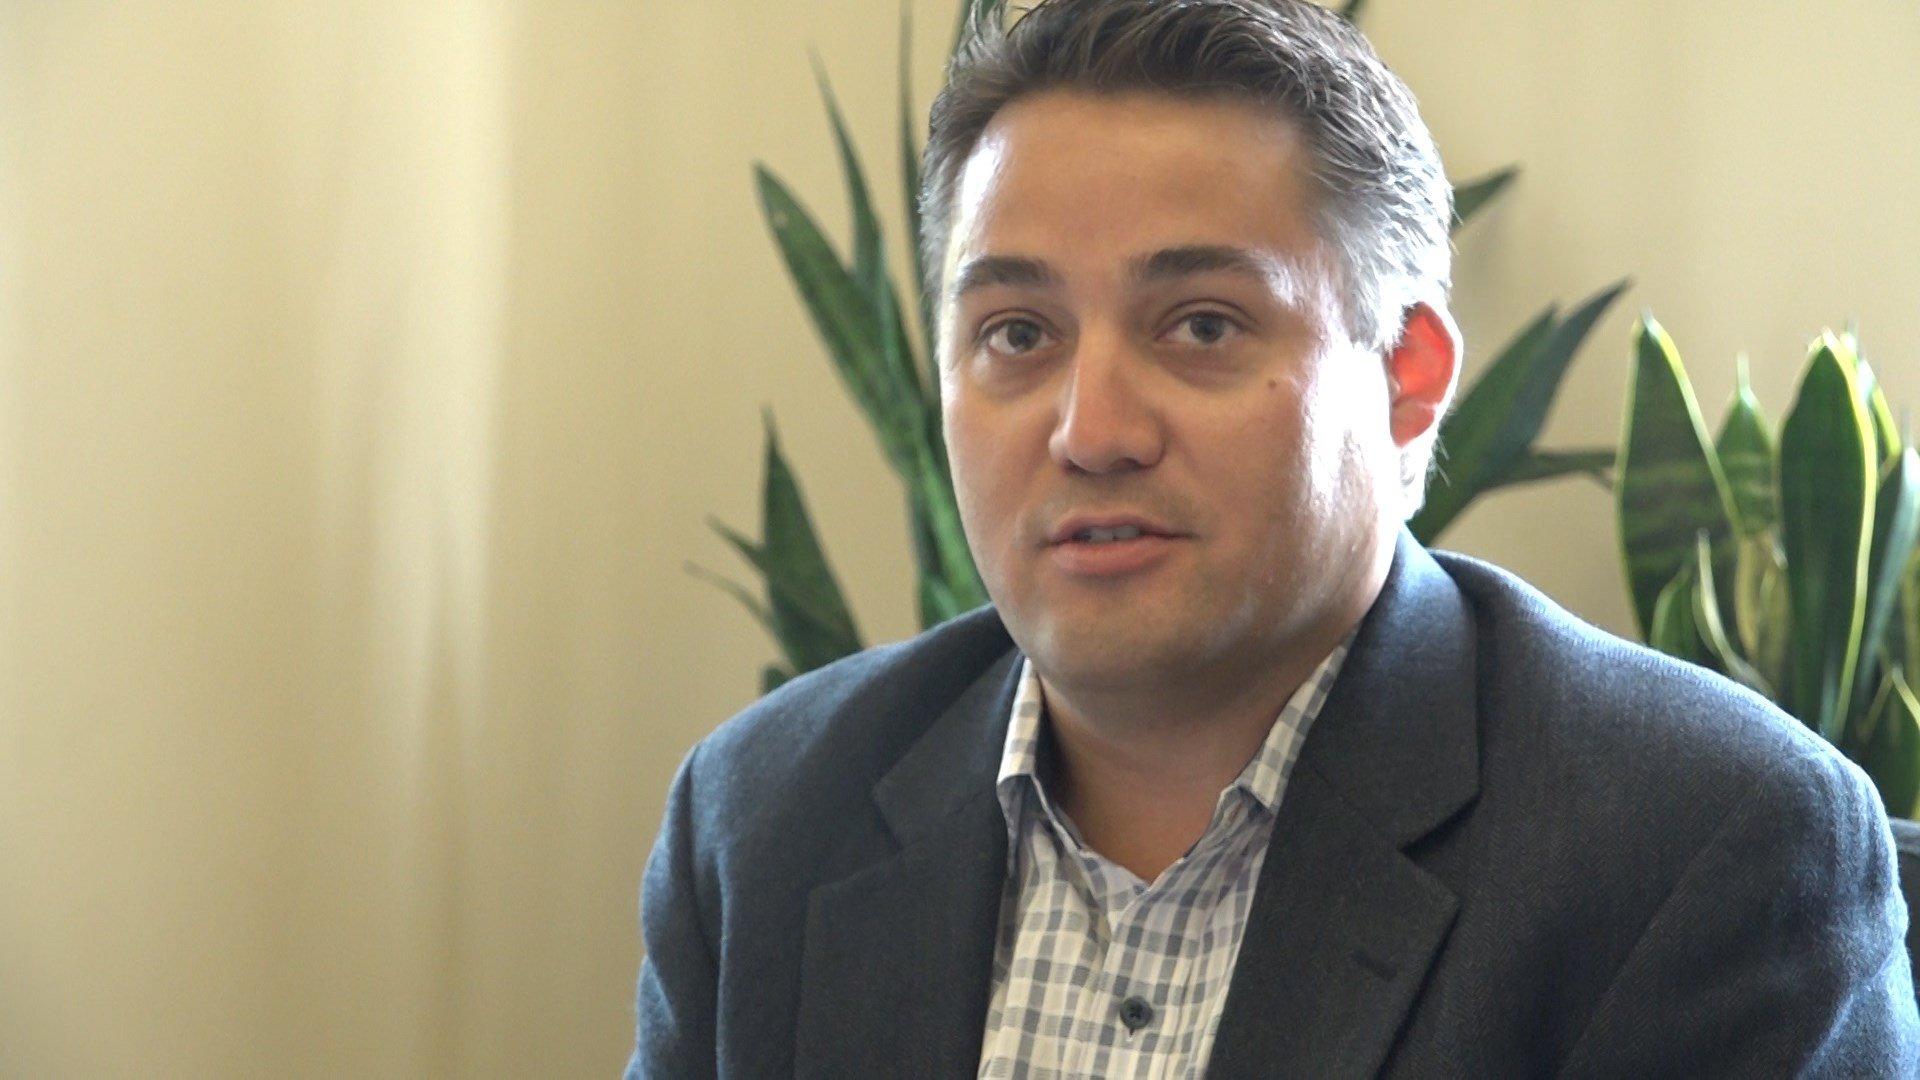 State Budget Director Dan Vills